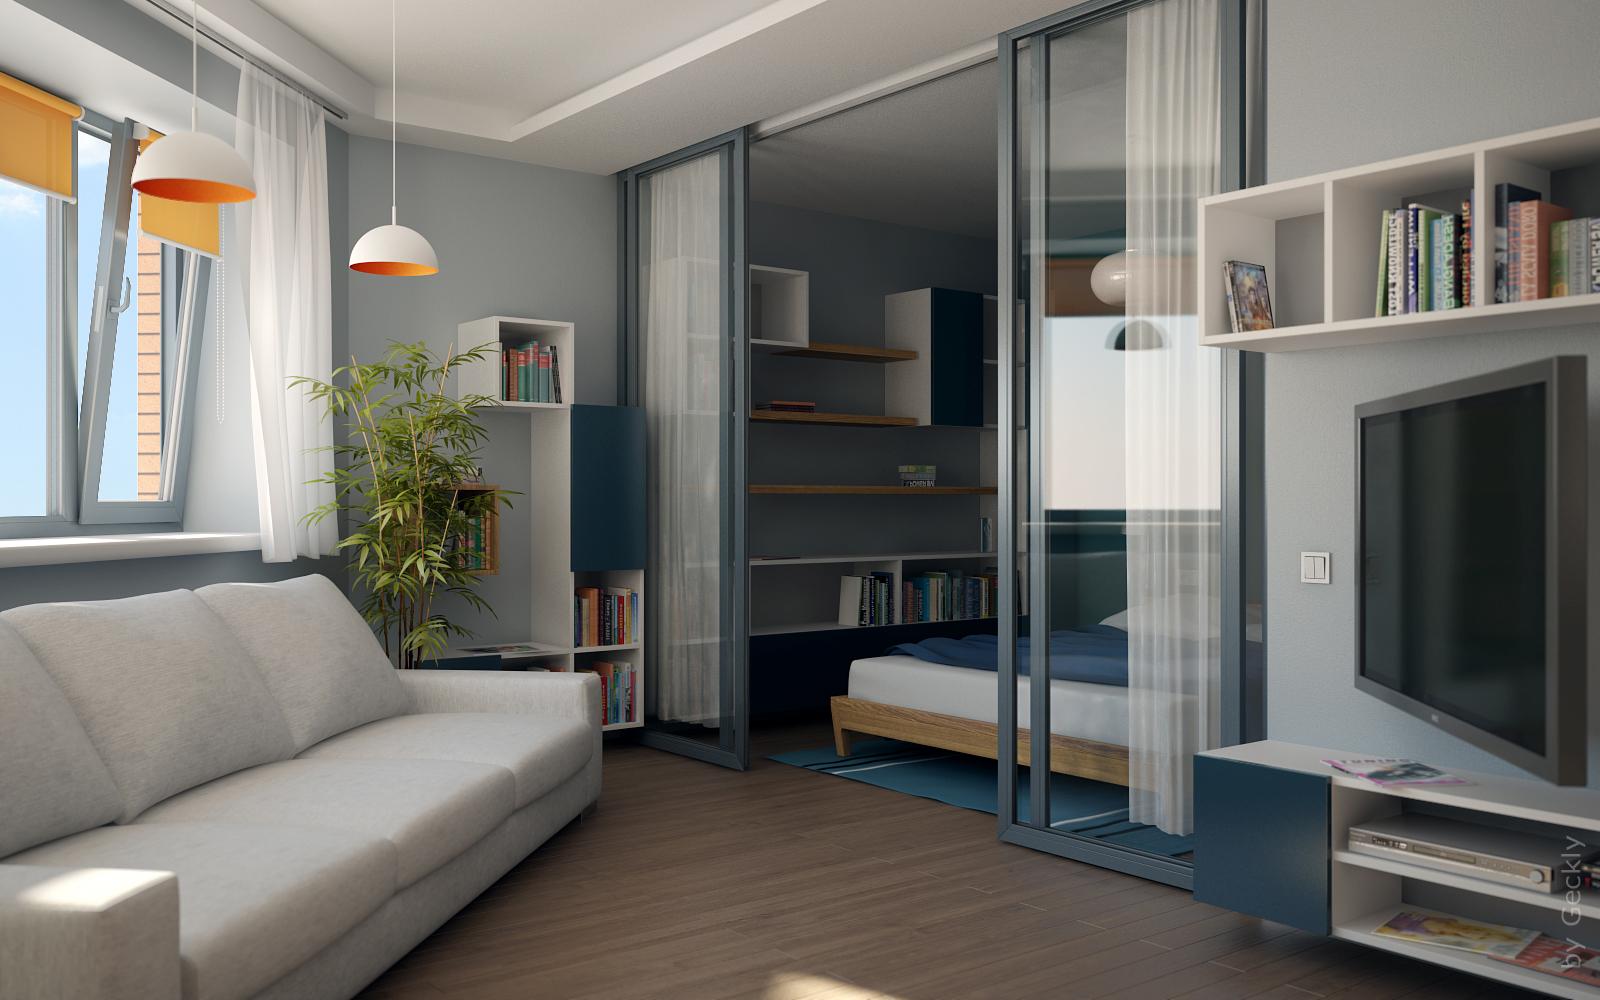 Интерьеры однокомнатных малогабаритных квартир фото